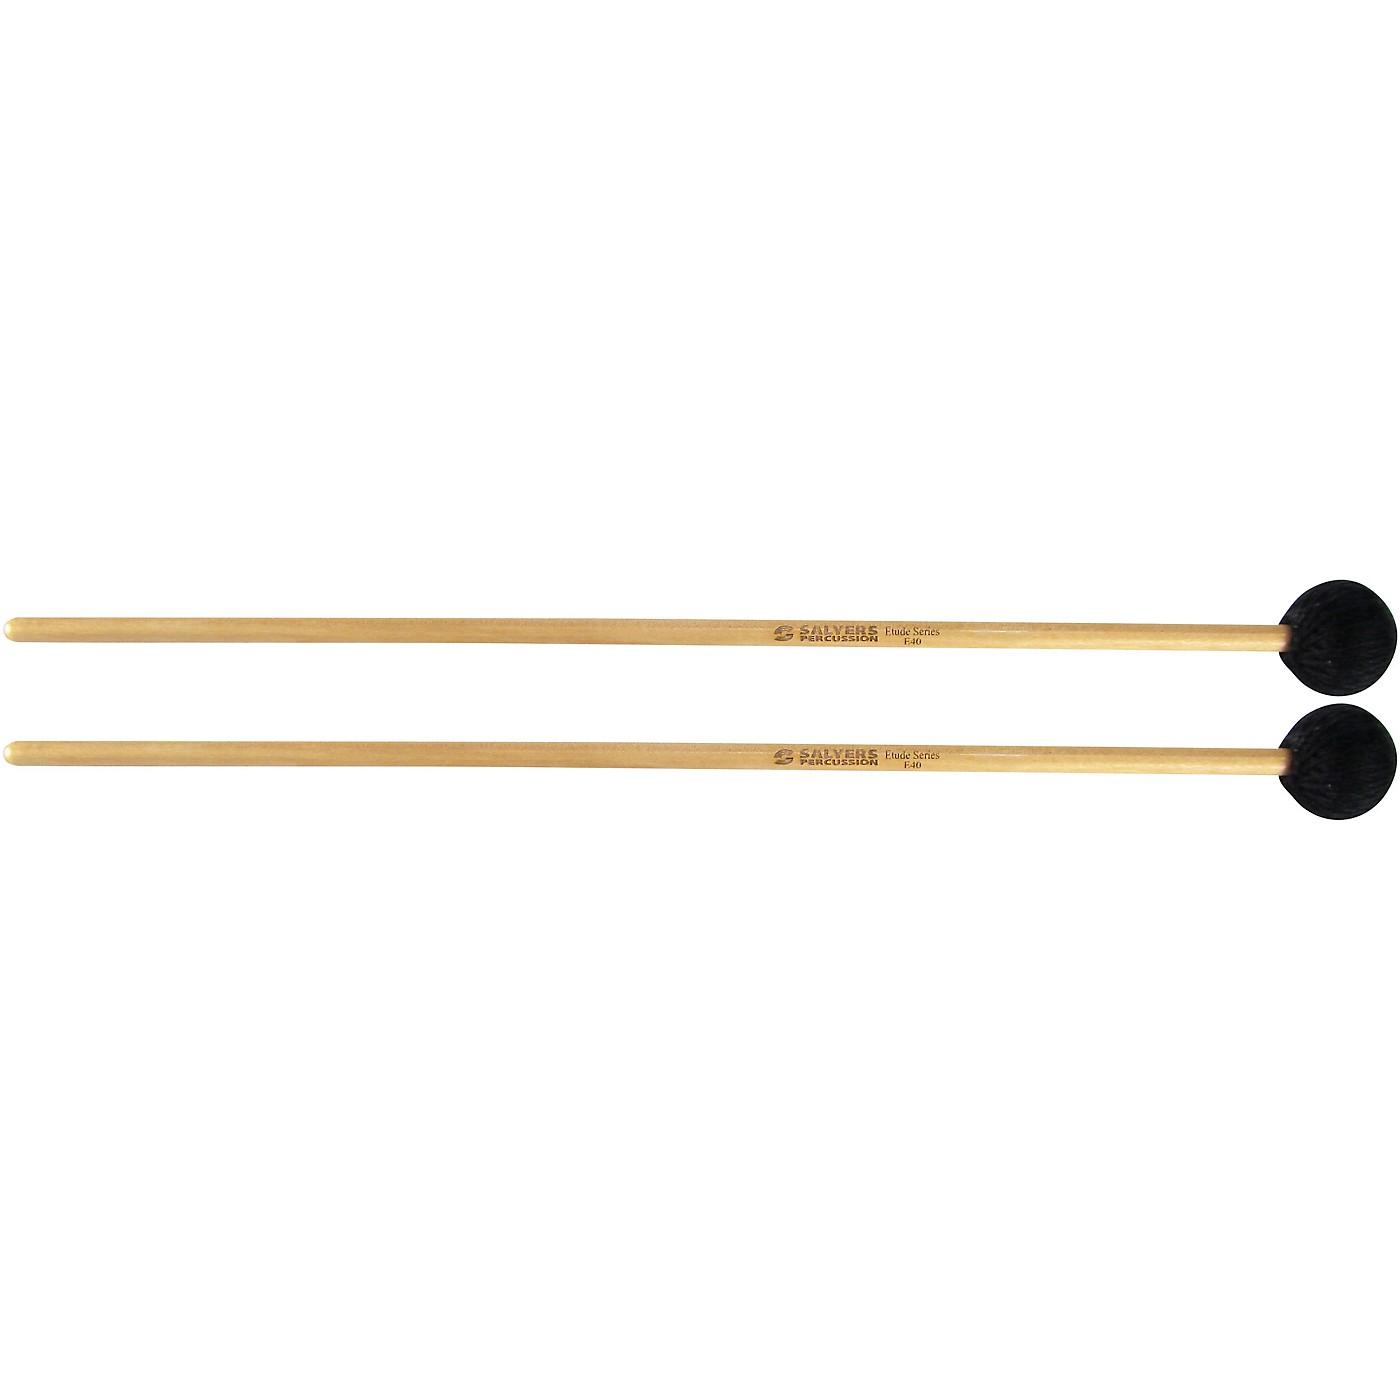 Salyers Percussion Etude Series Cord Vibraphone Mallets thumbnail